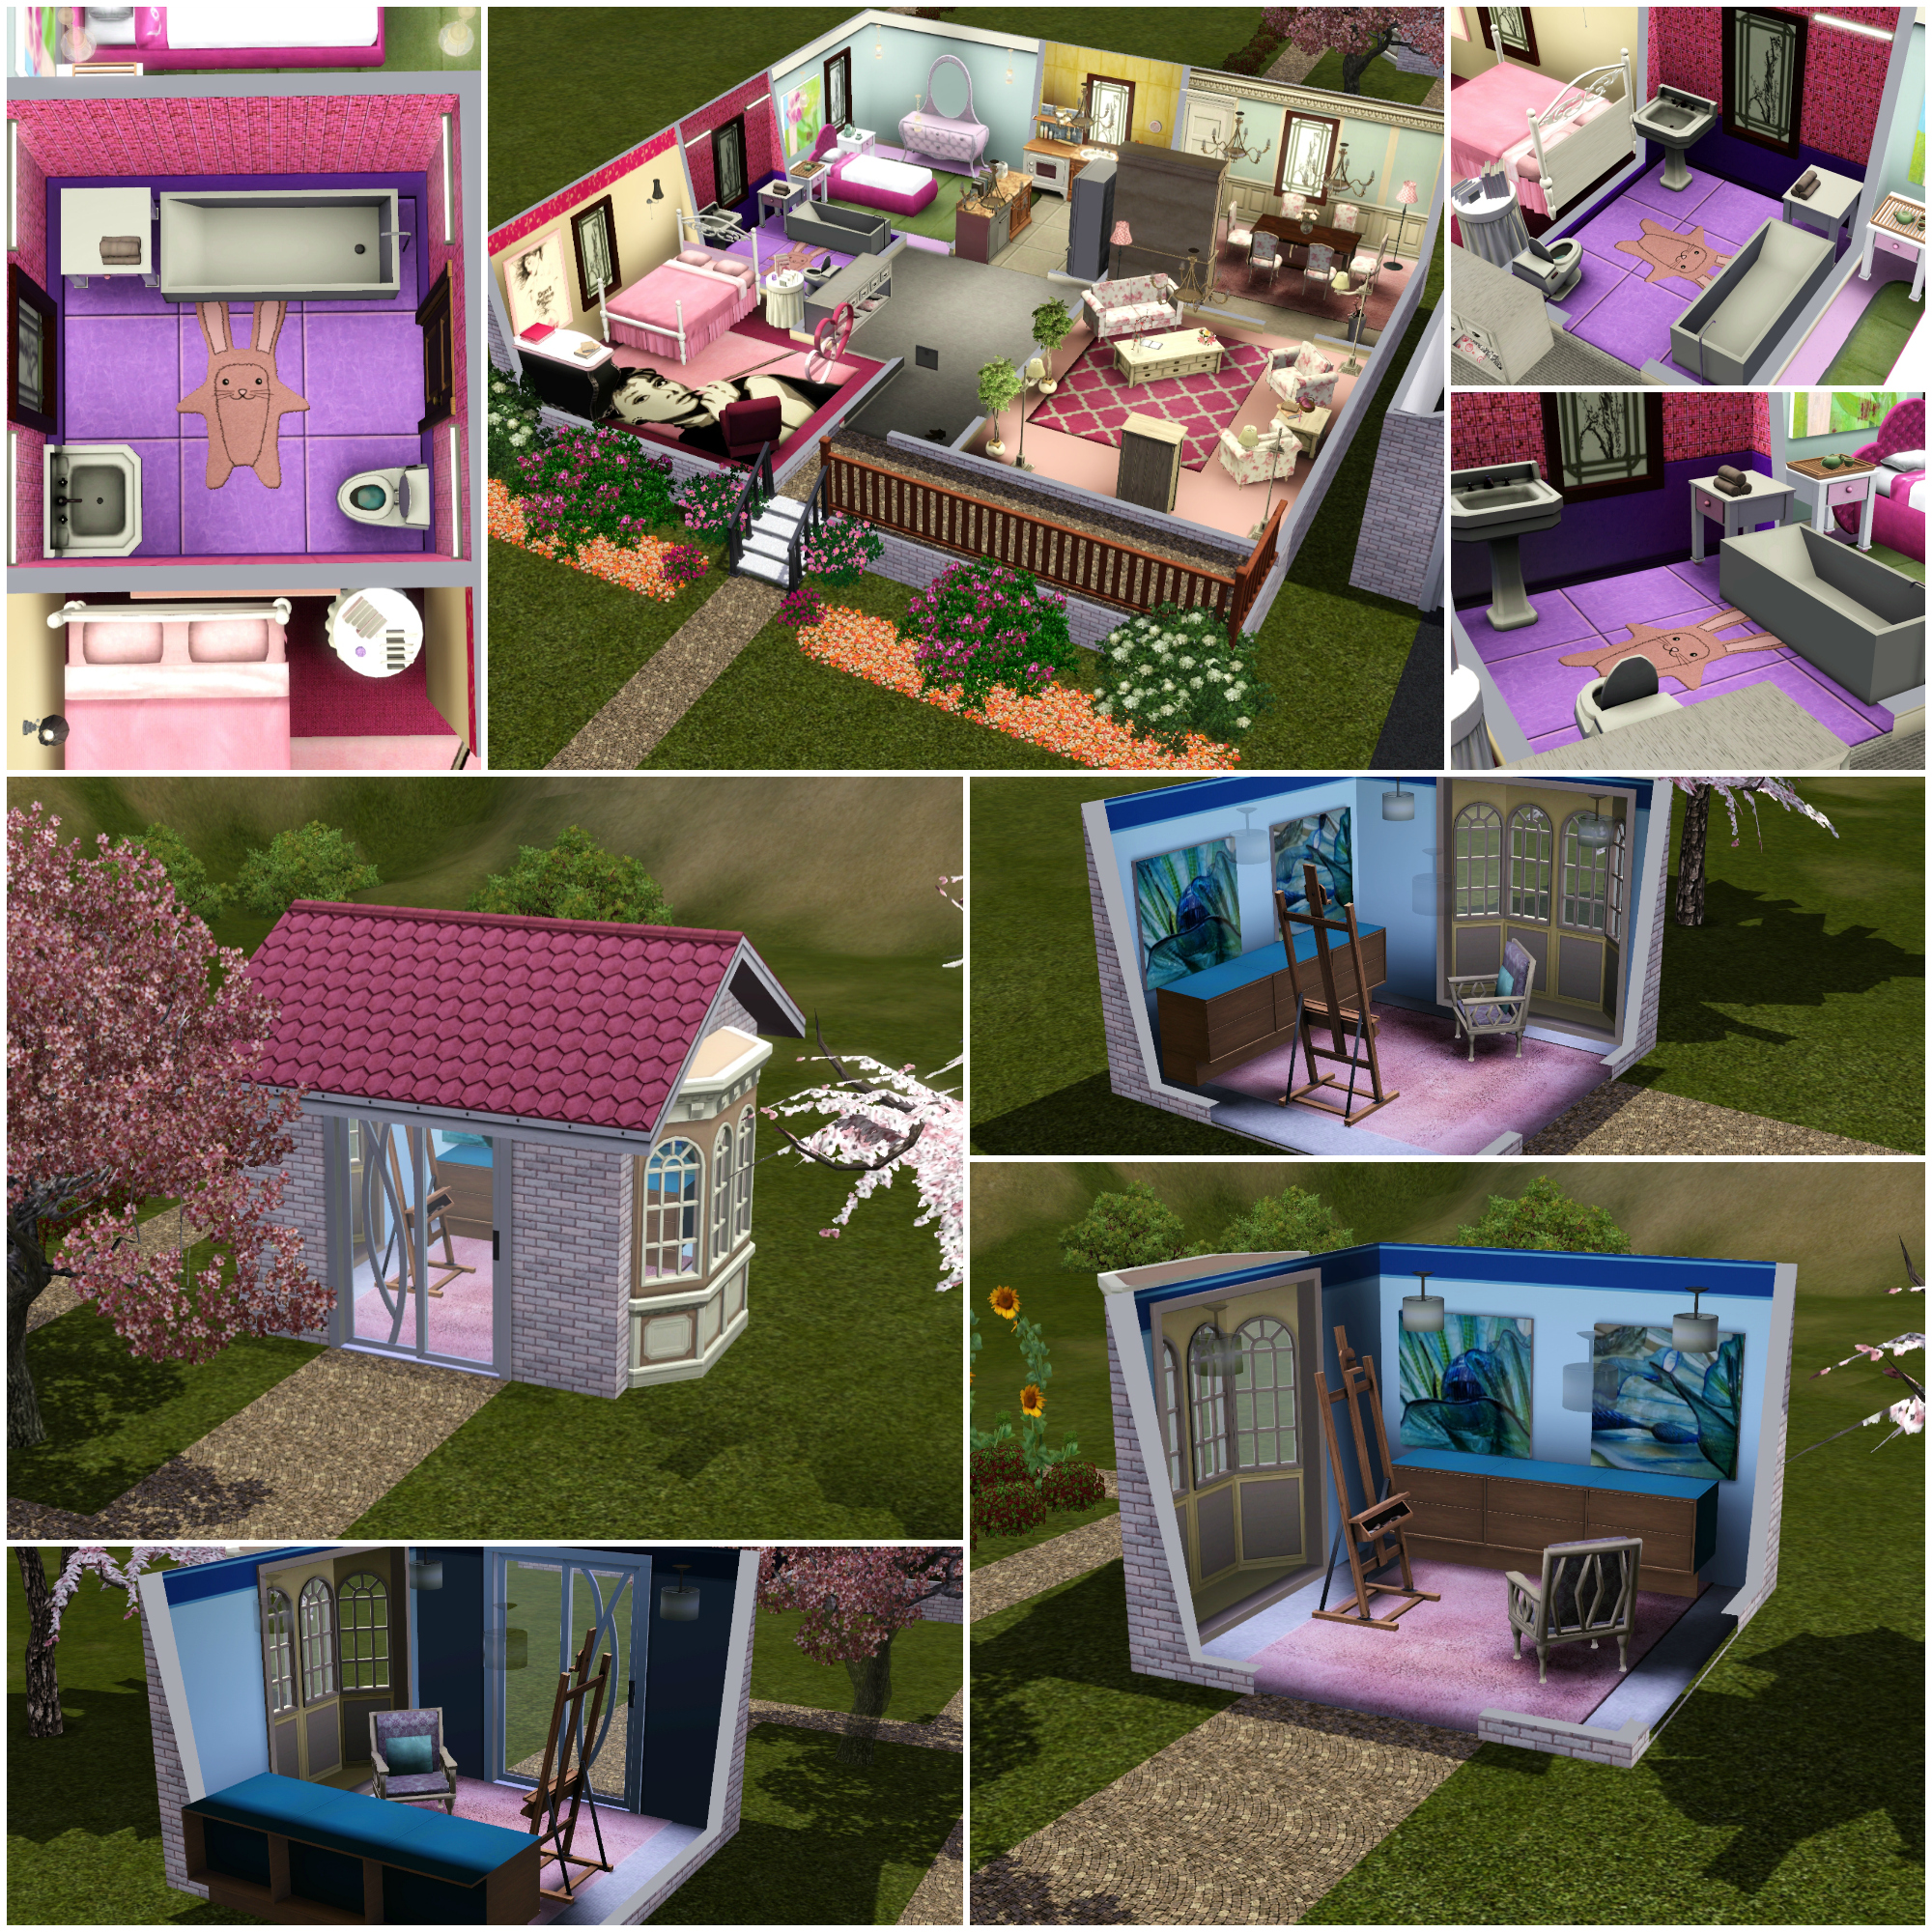 Dream Homes Assignments 21968327889_70f07f2111_o